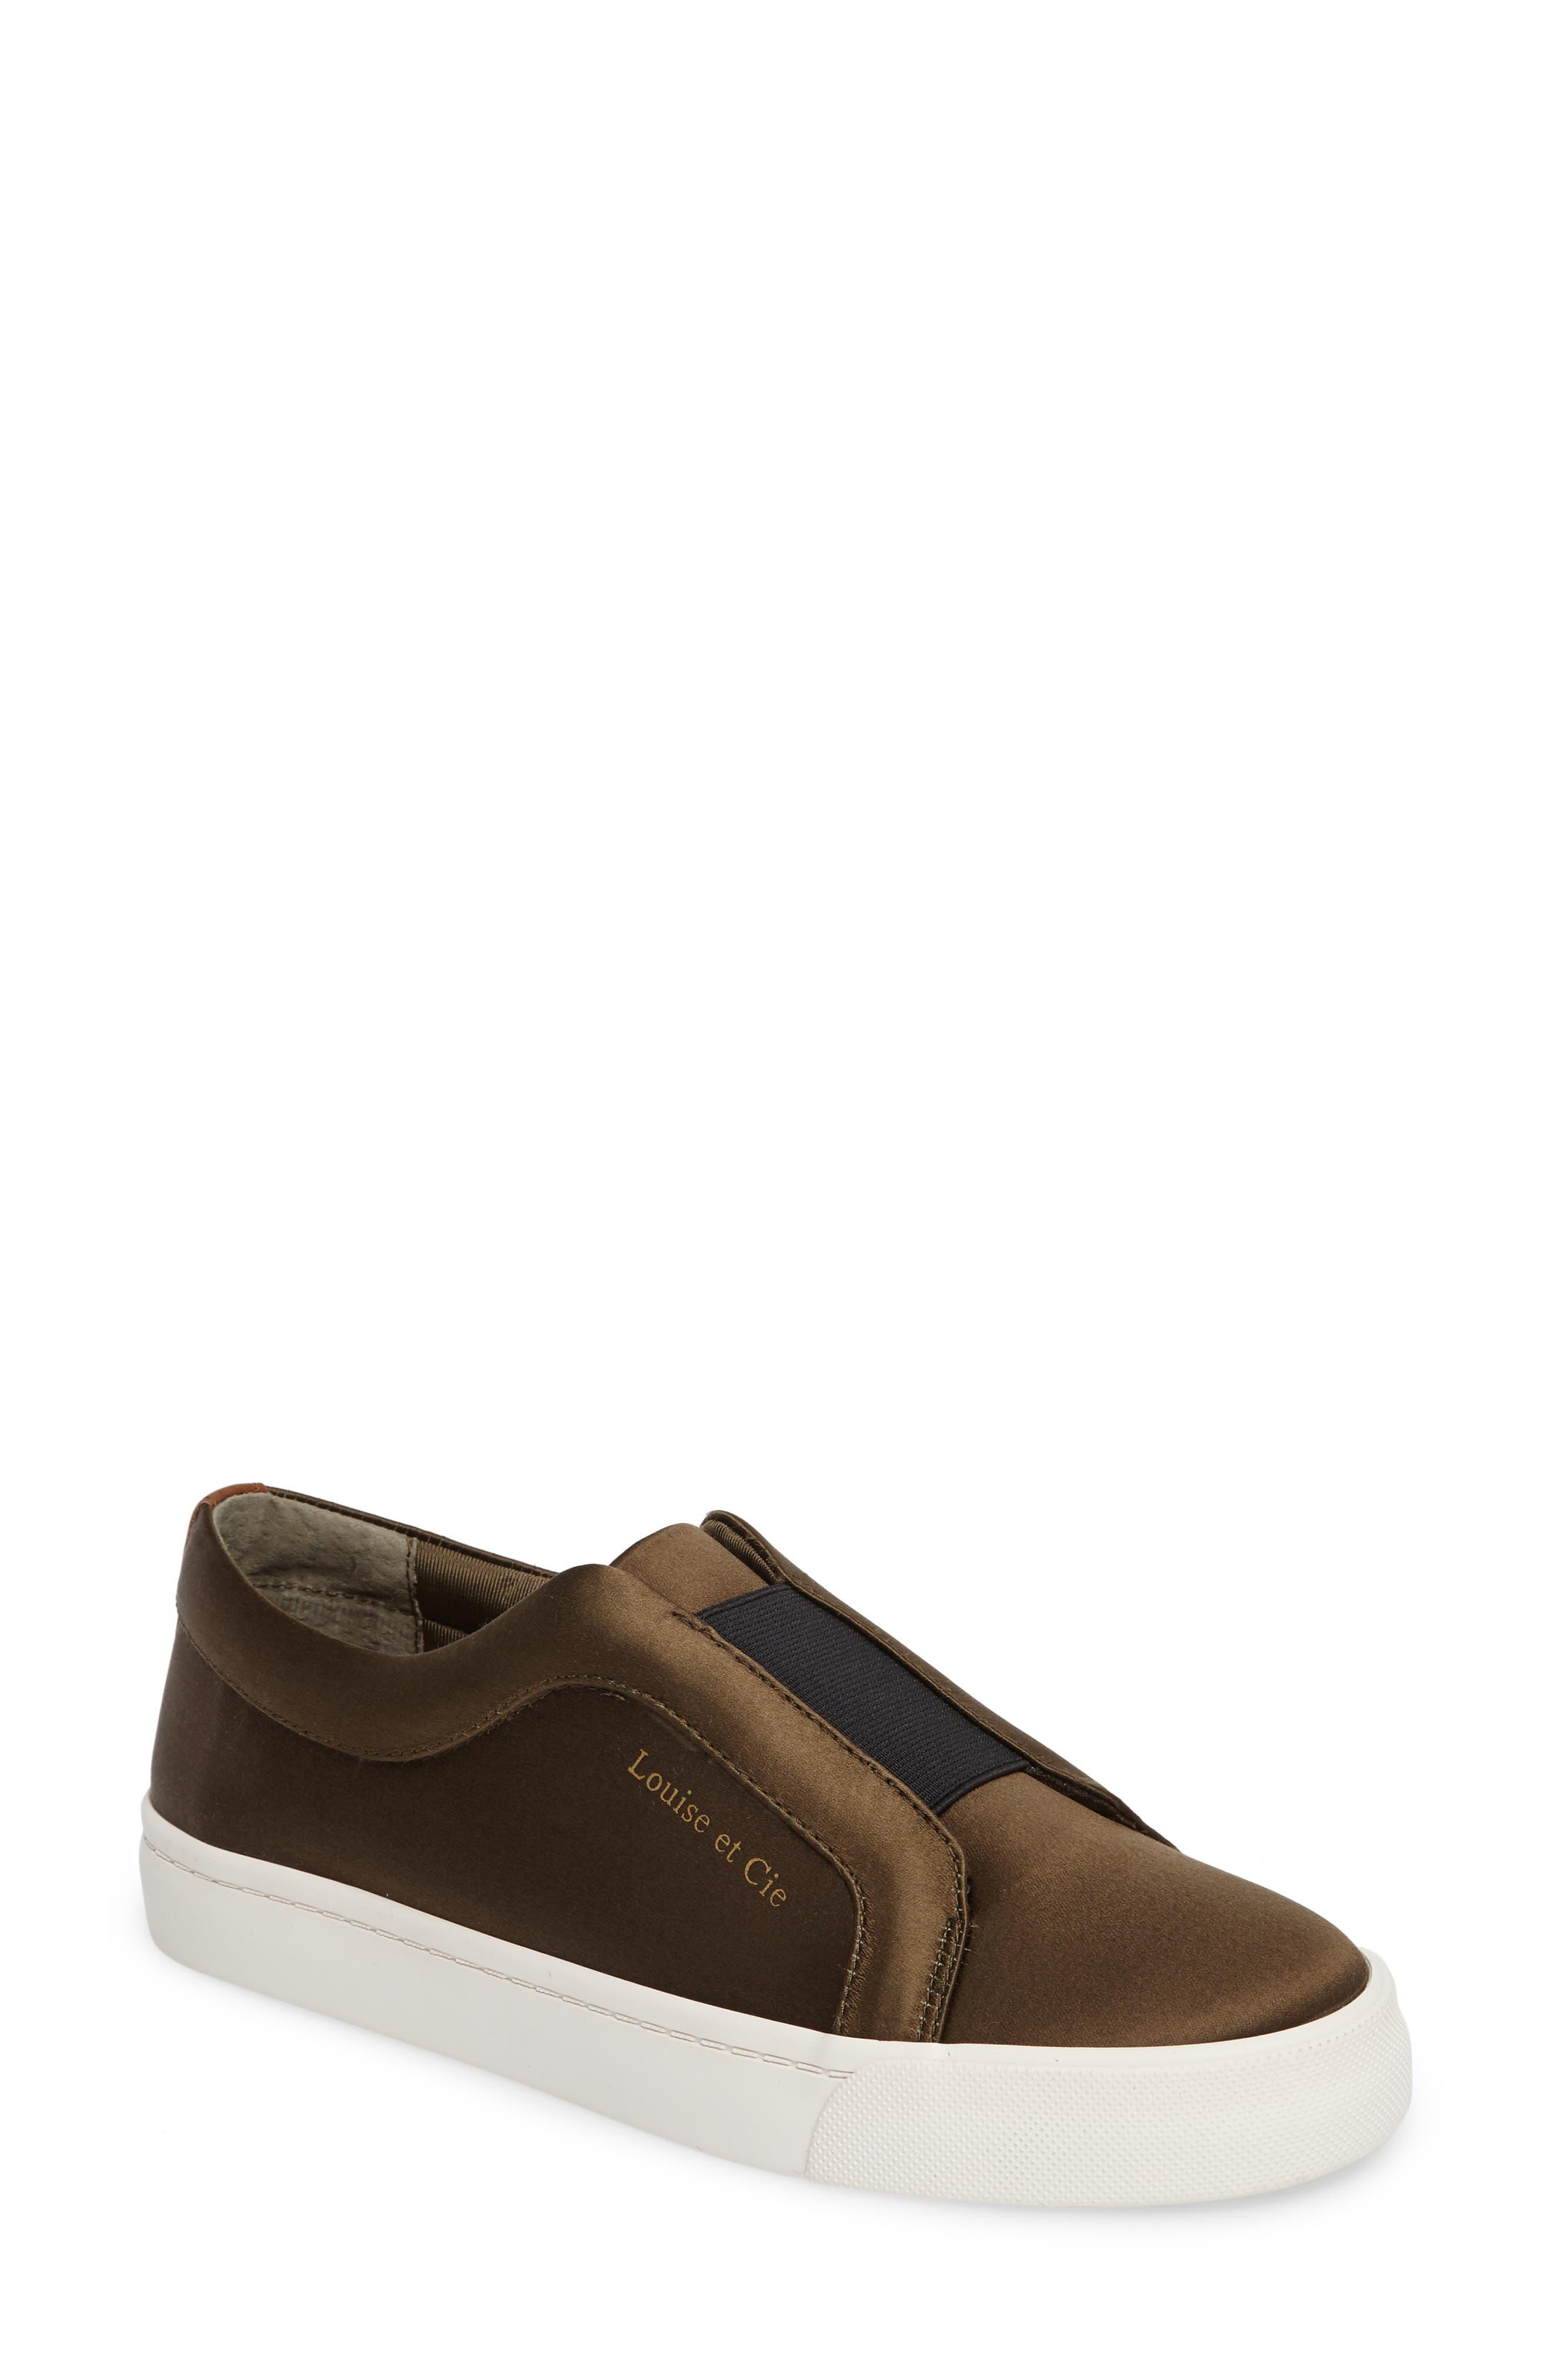 Bette Slip-On Sneaker,                             Main thumbnail 1, color,                             Peacoat/ Black Satin